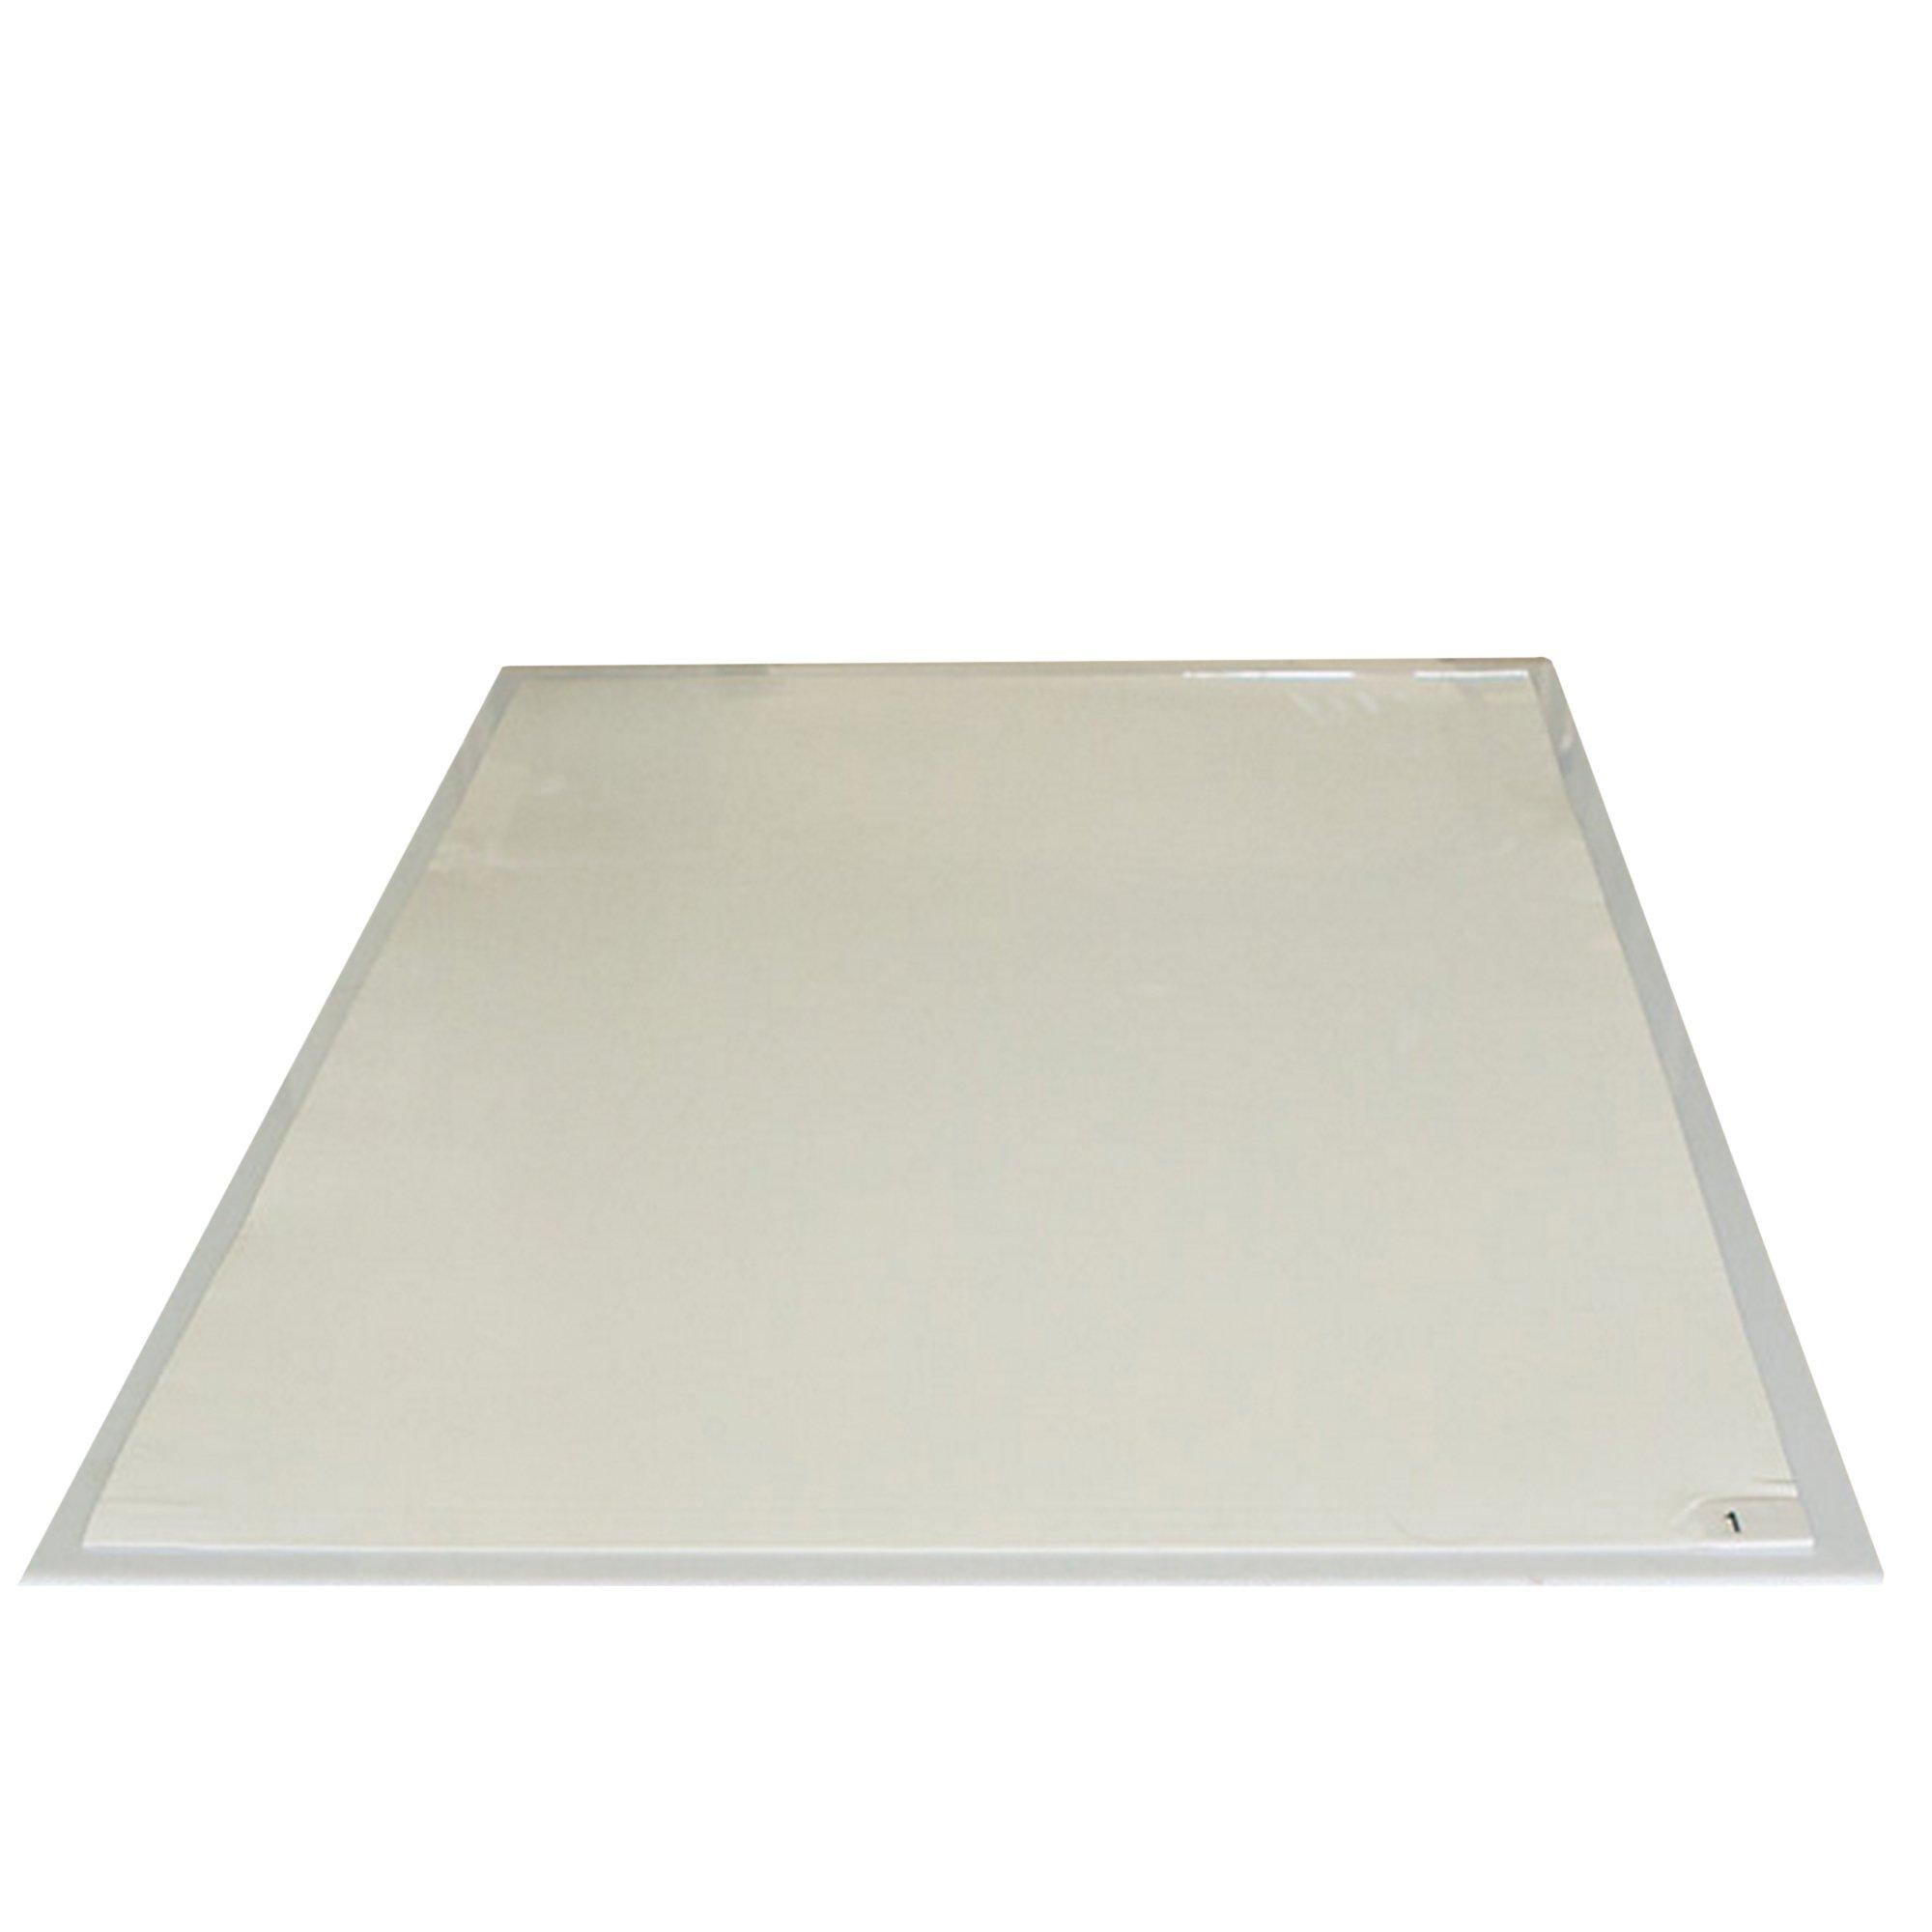 Plasticover Non-Skid Base for Sticky Floor